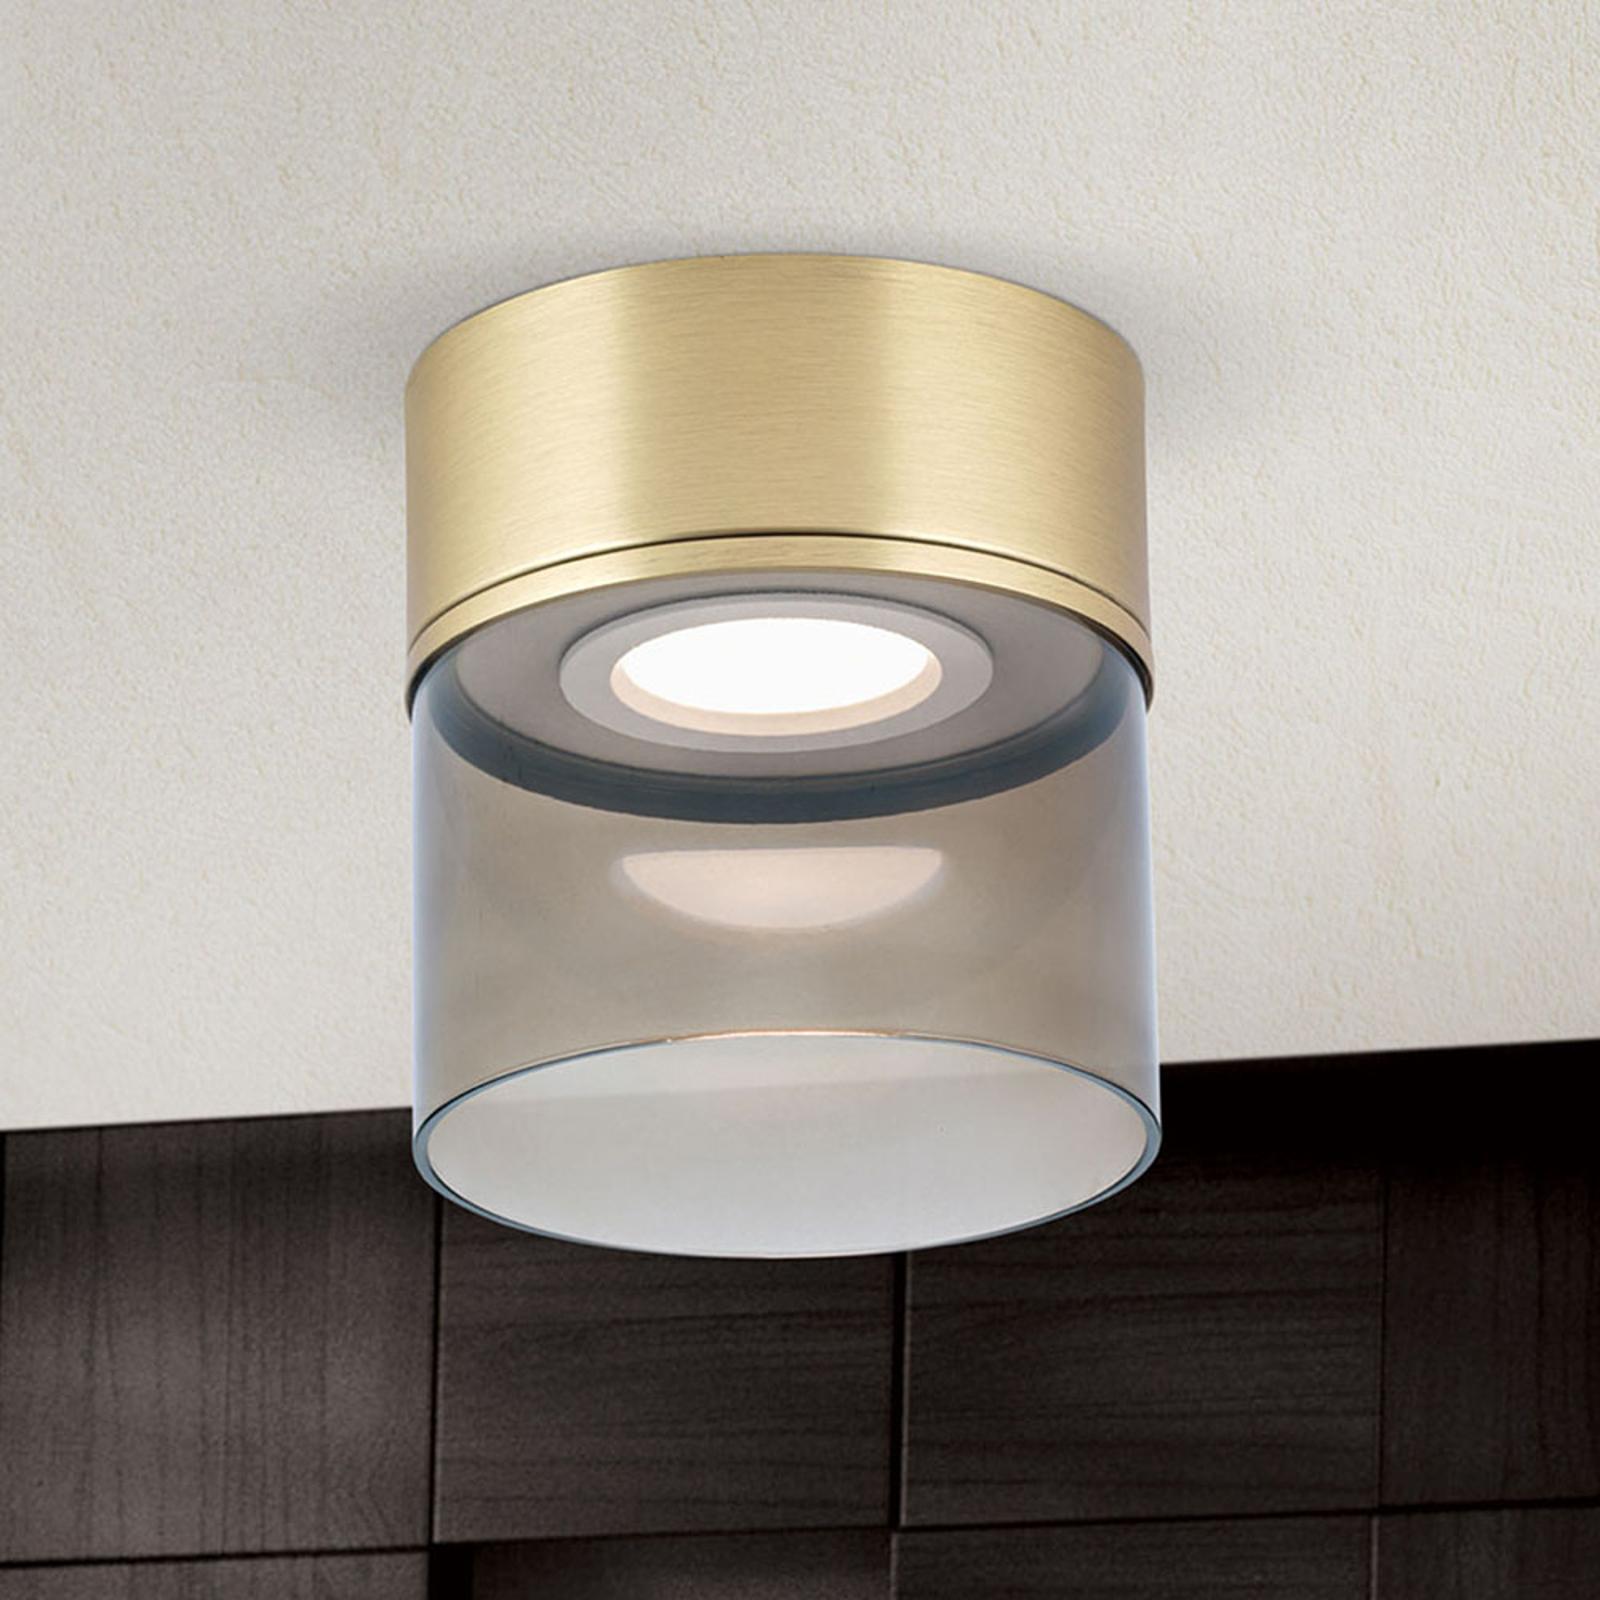 Plafoniera LED Francis ottone satinato Ø 15 cm